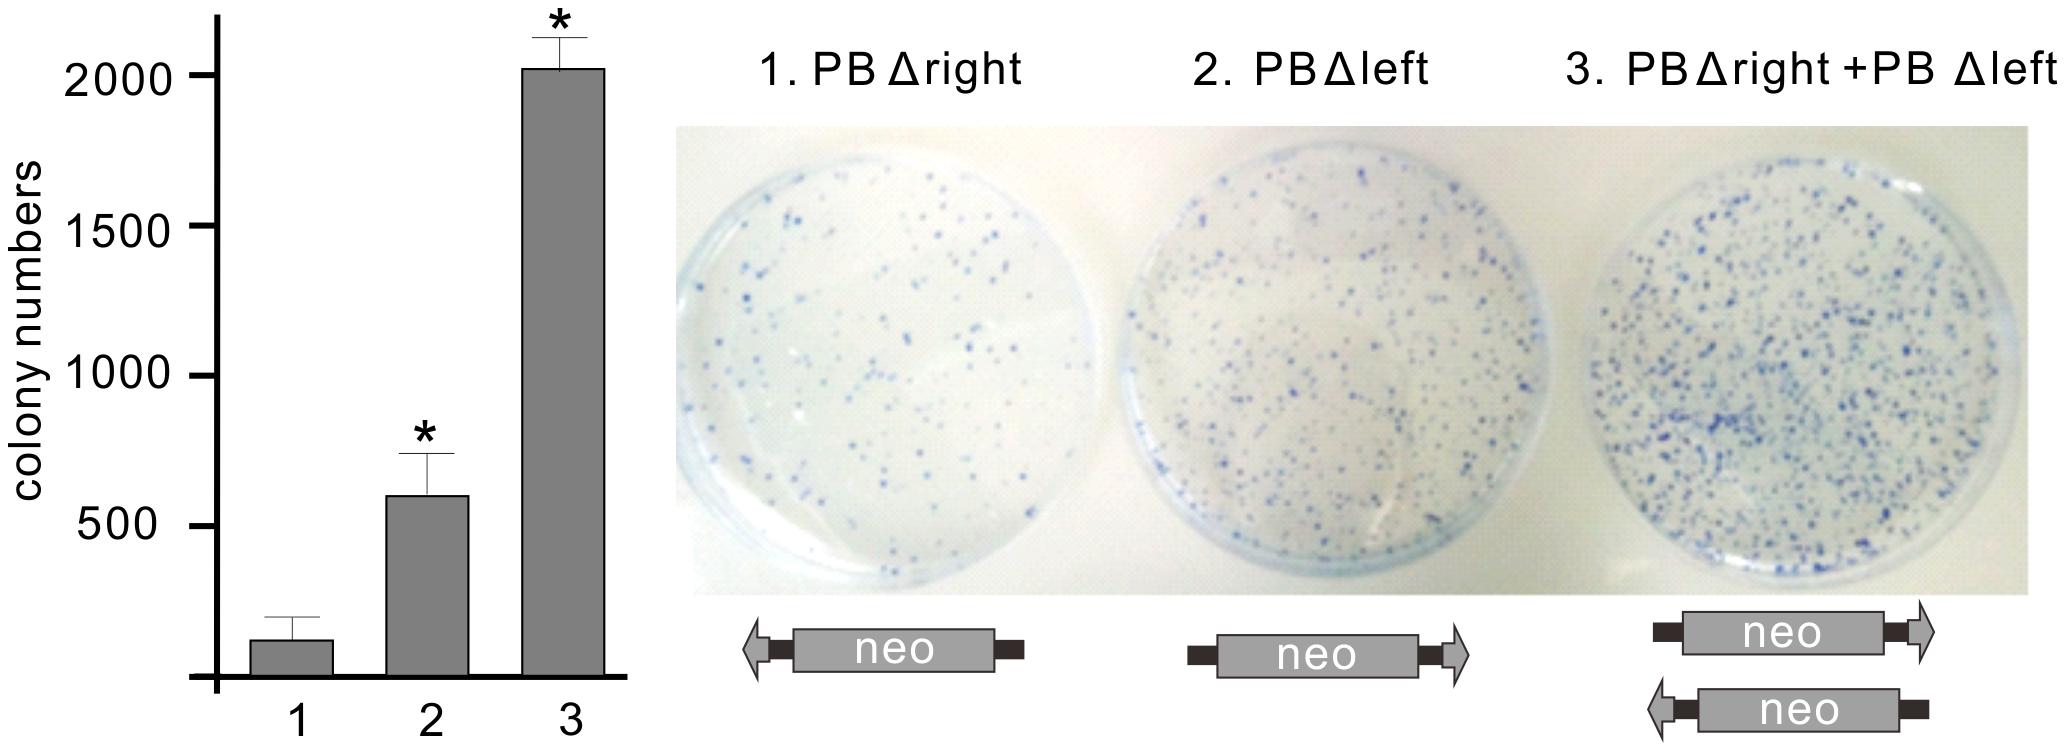 Bimolecular transposition events generated by <i>PB</i>.